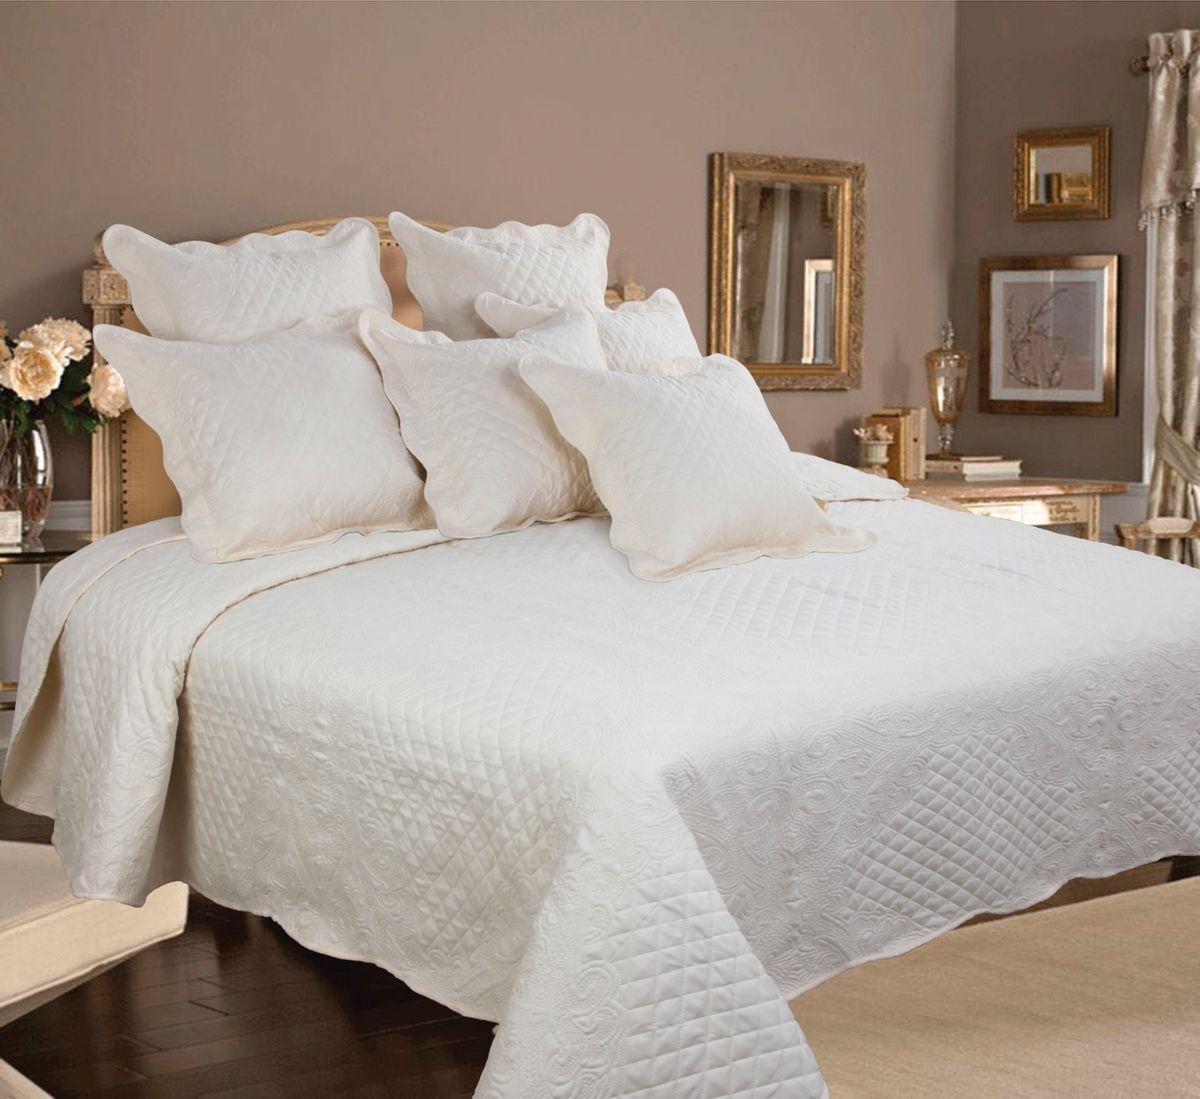 Комплект для спальни Mona Liza Royal Milky: покрывало 240 х 260 см, 2 наволочки 40 х 40 см, цвет: молочный